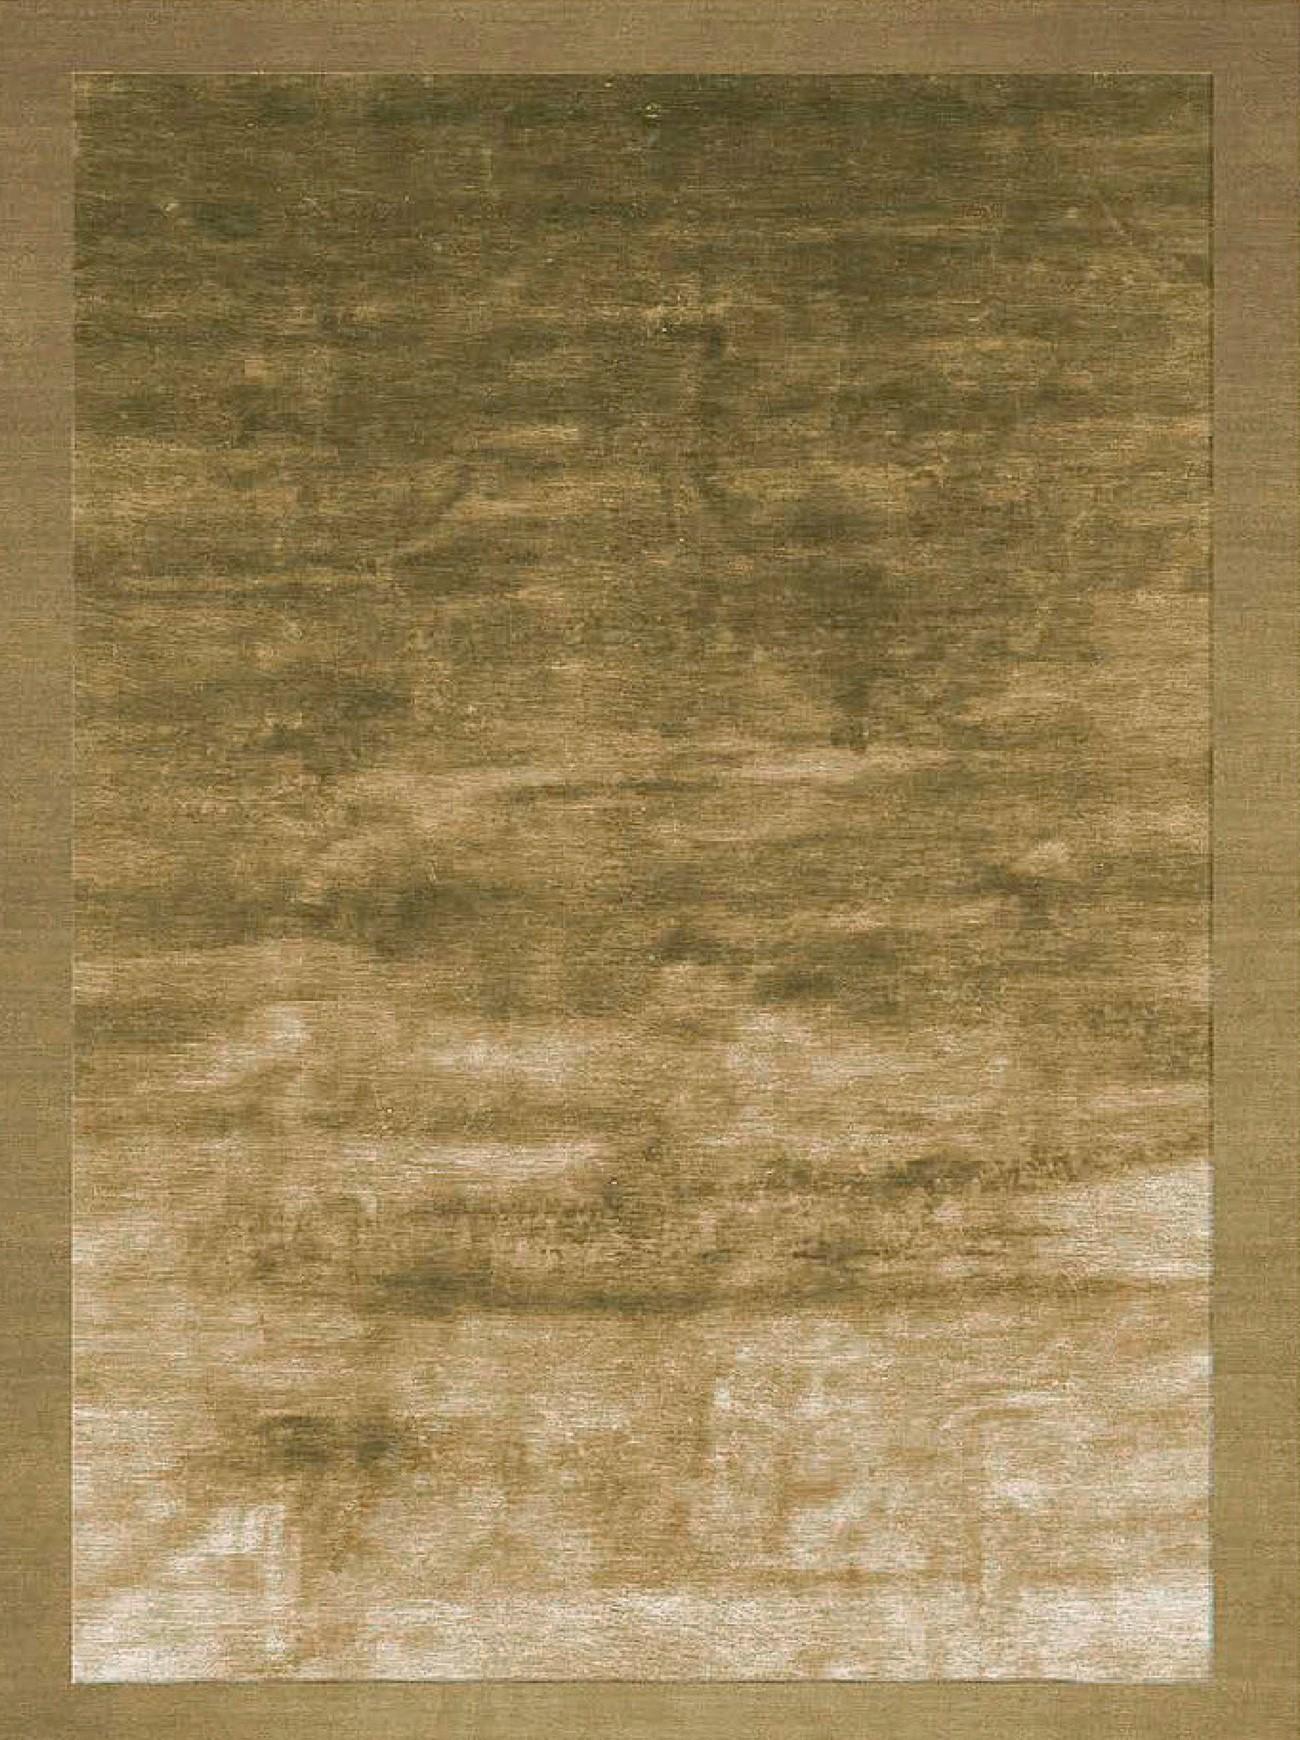 Poliform_tappeti_FRAME_04_finiture_1300x1740px_Gold